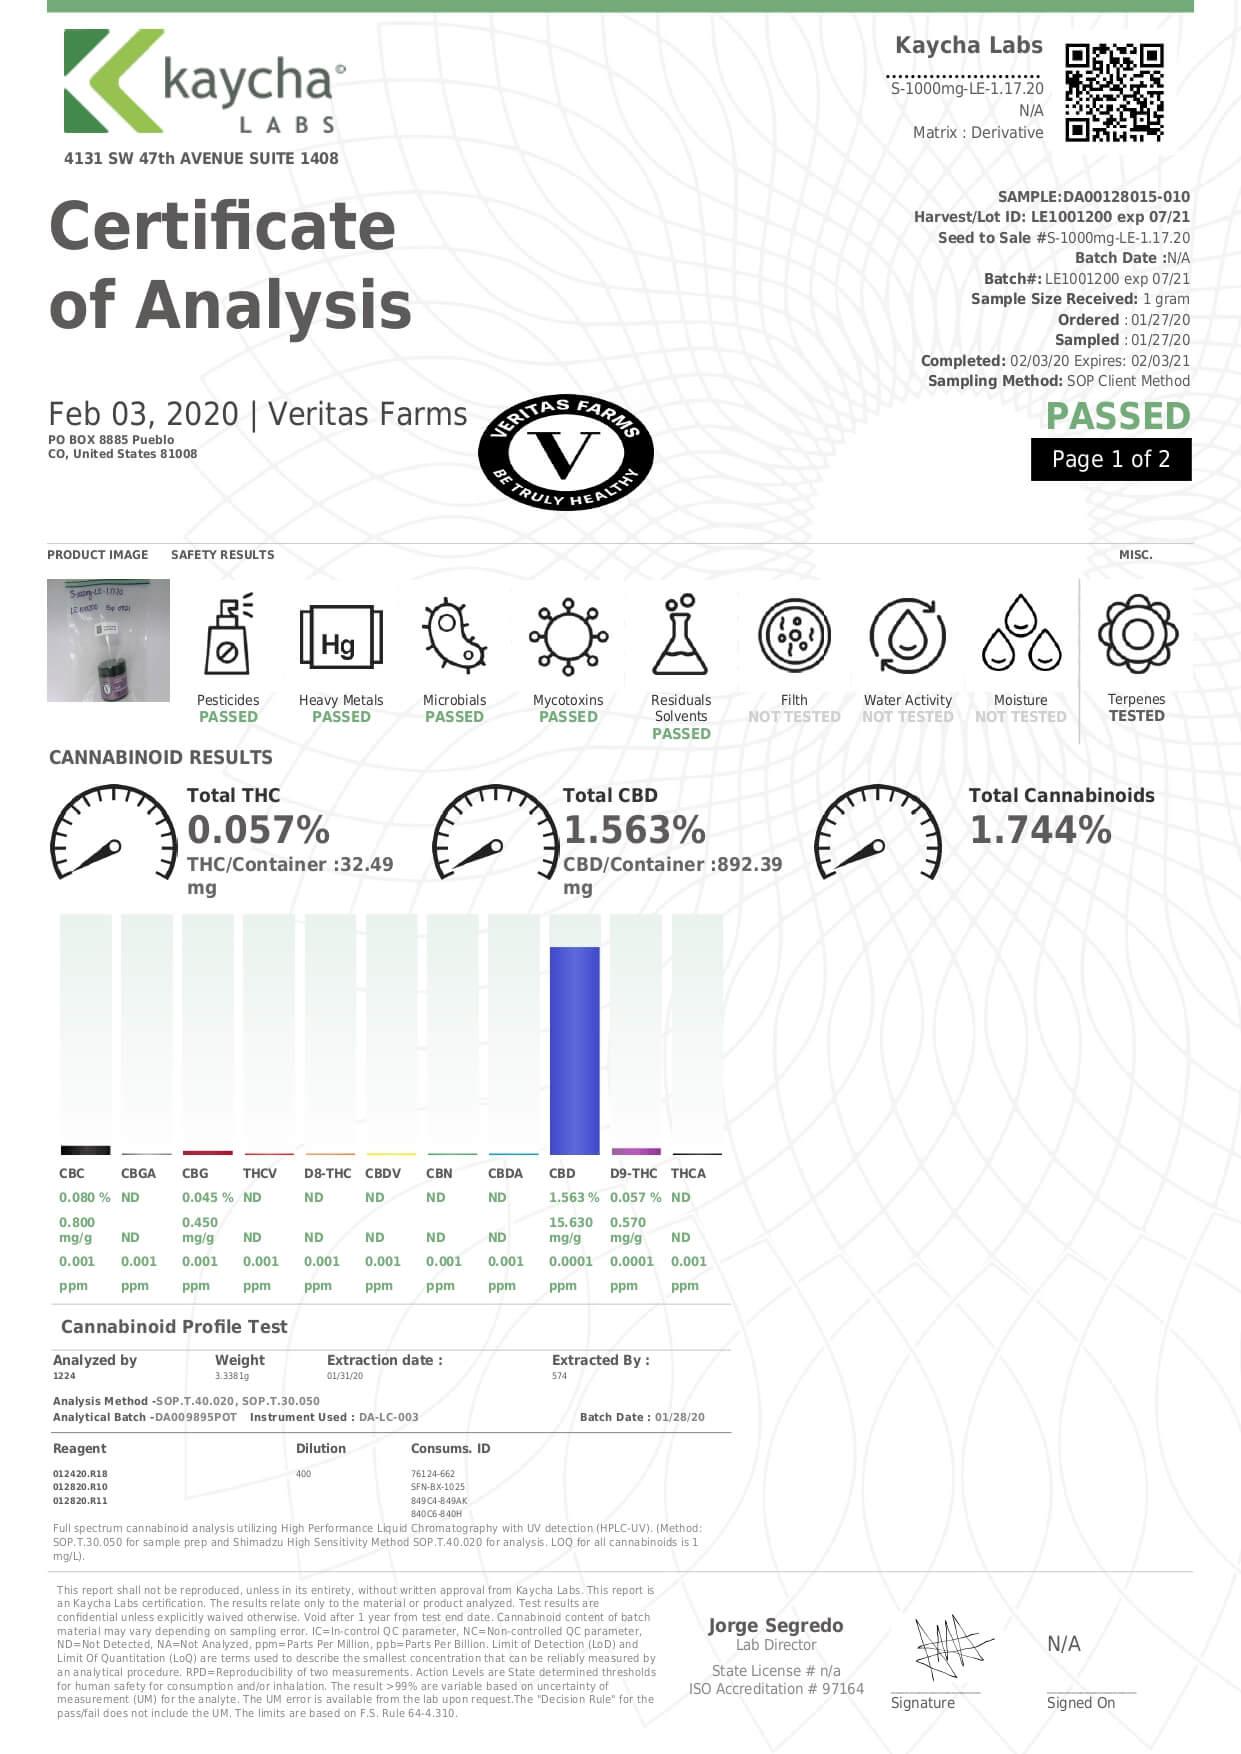 Veritas Farms CBD Topical Full Spectrum Lavender Eucalyptus Salve 1000mg Lab Report